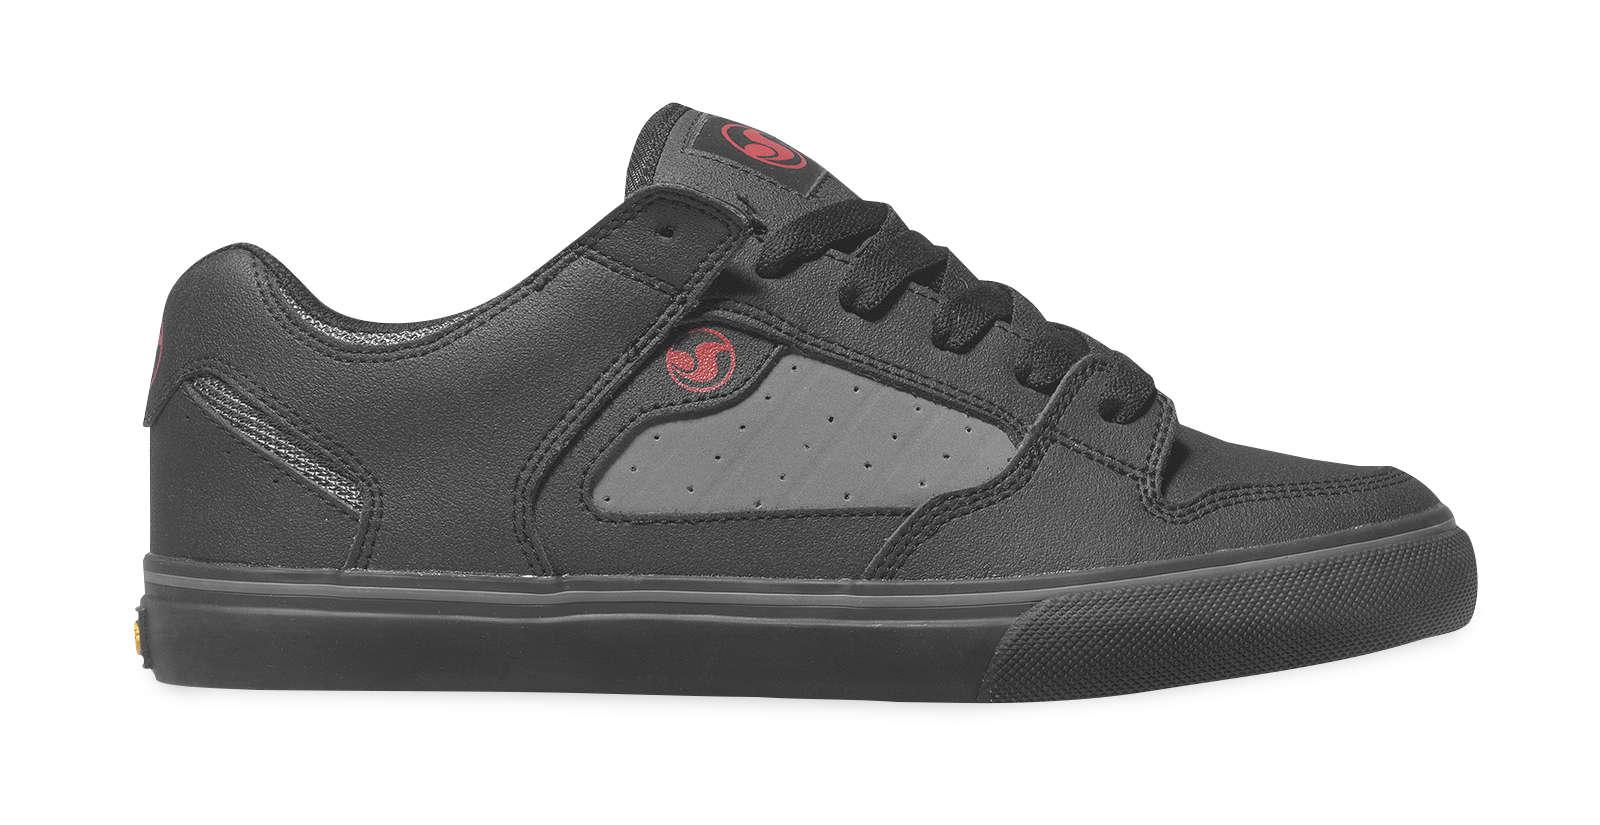 Militia CT FMF Shoes